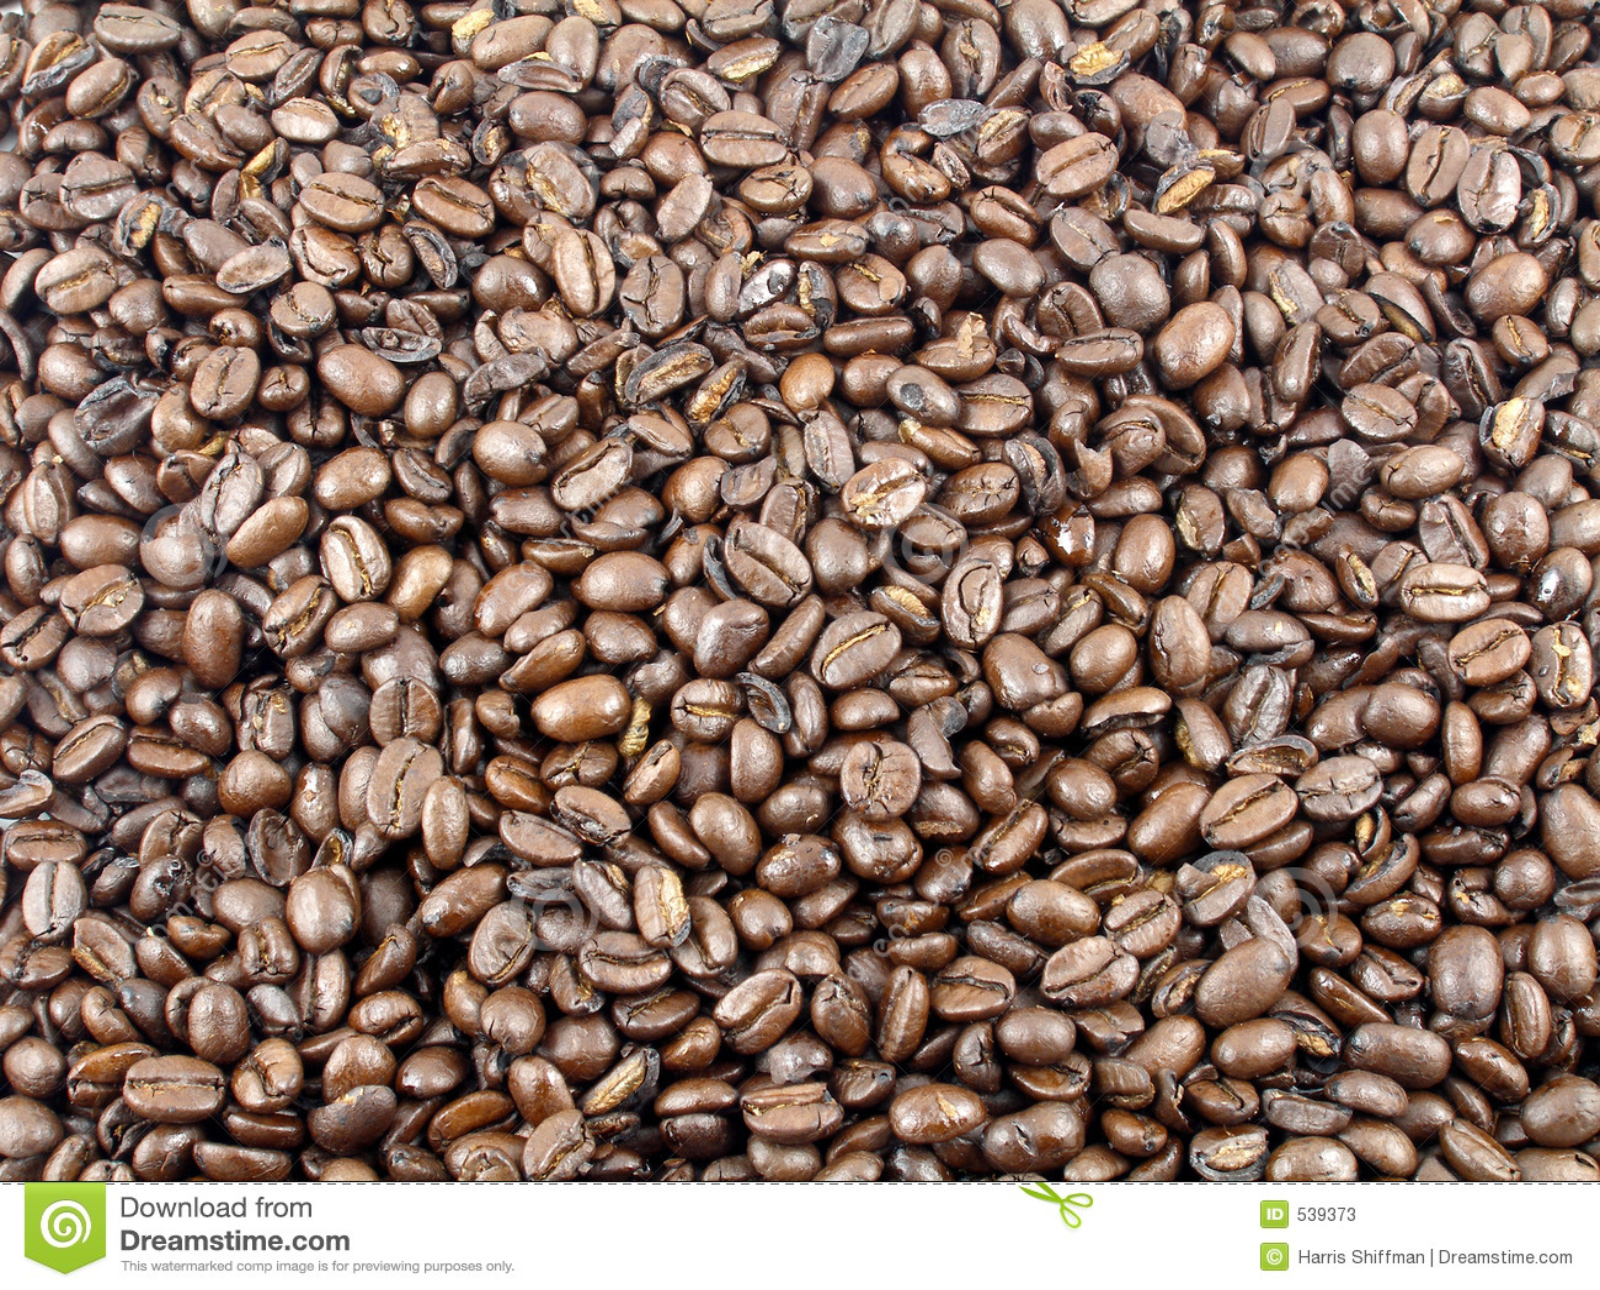 Download 豆咖啡 库存图片. 图片 包括有 全部, browne, 背包, 上等咖啡, 饮料, java, 纹理, 咖啡 - 539373